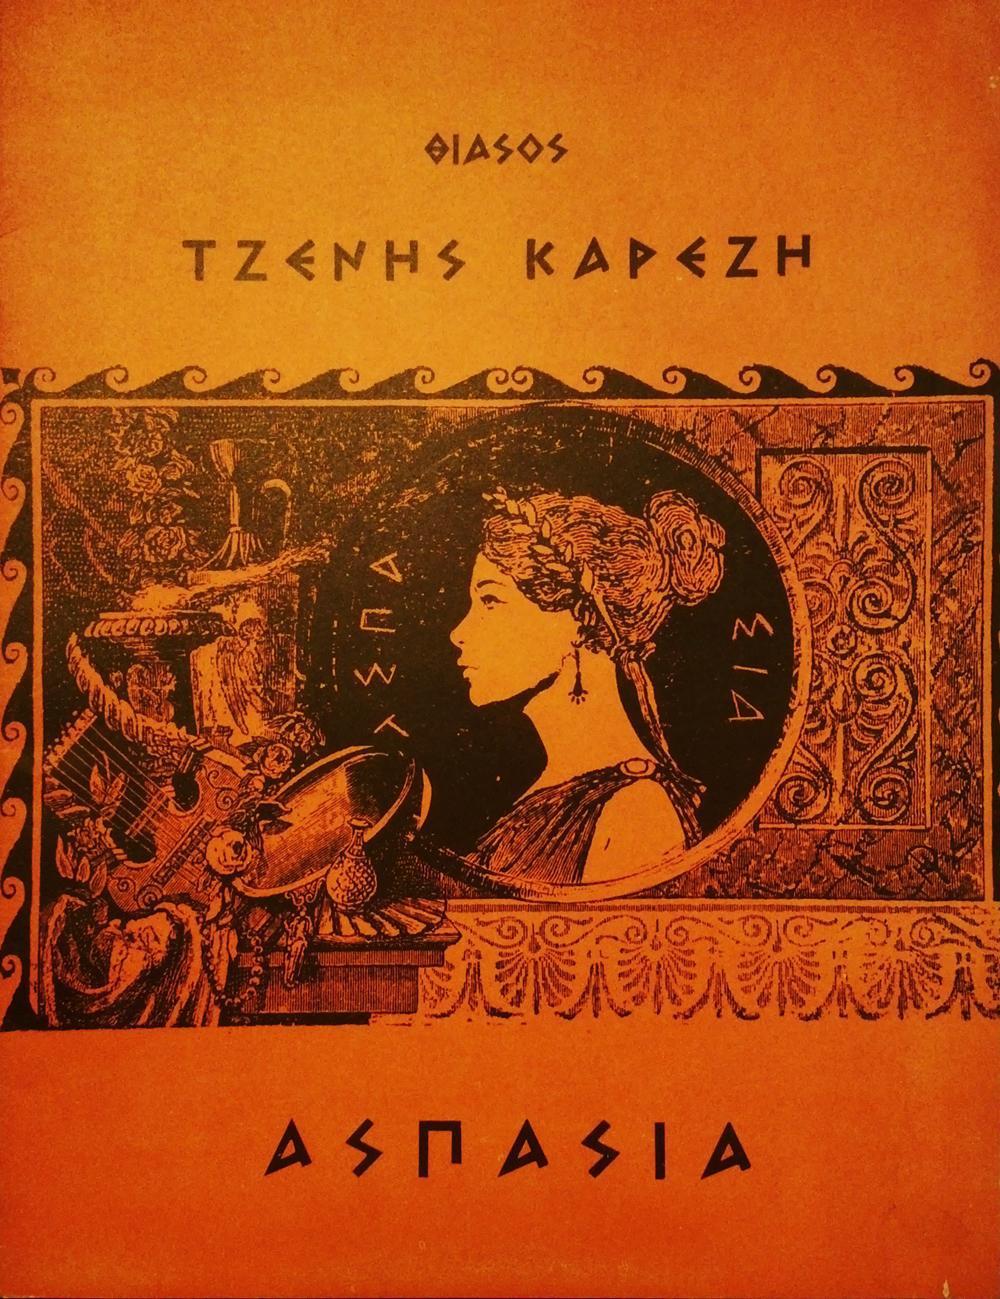 H ιστορία του θρυλικού θεάτρου Χατζώκου στην Αριστοτέλους Θεσσαλονίκης dc7ddb6d969